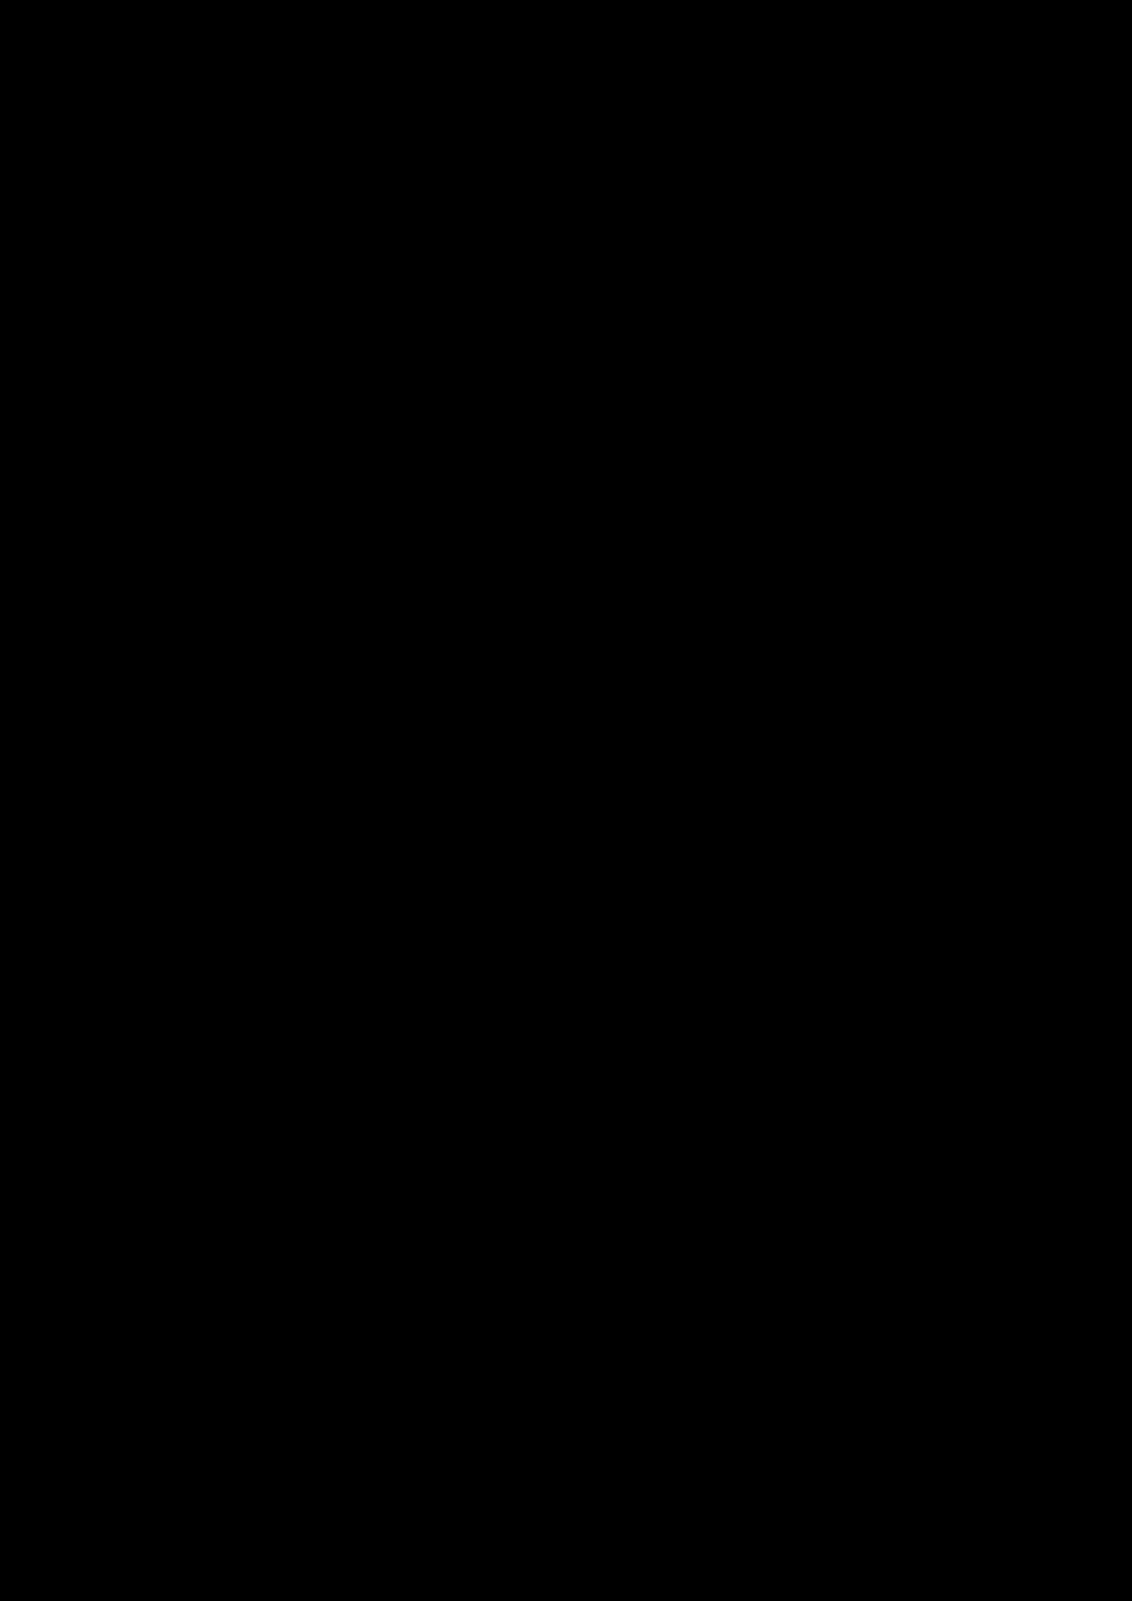 Belyiy sokol slide, Image 16